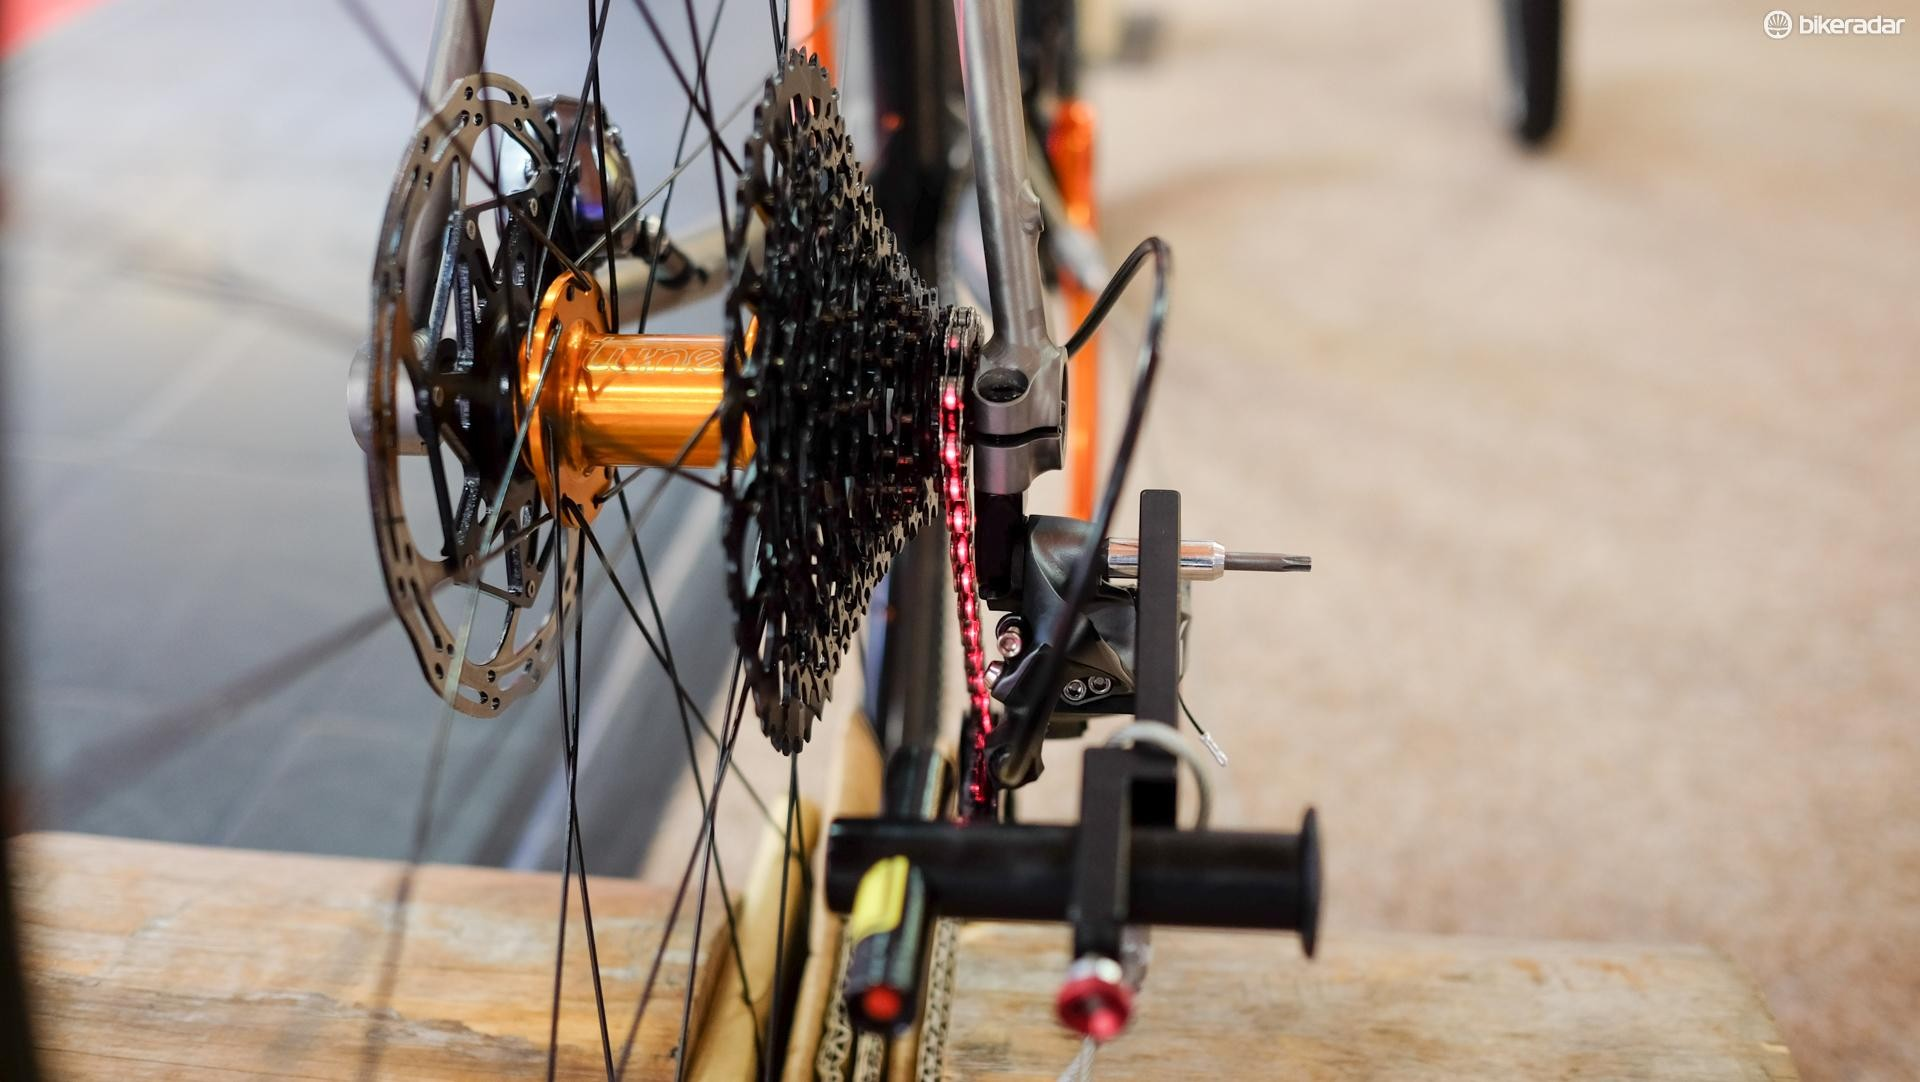 Tune's Linientreu brings frikkin' laser beams to gear setup